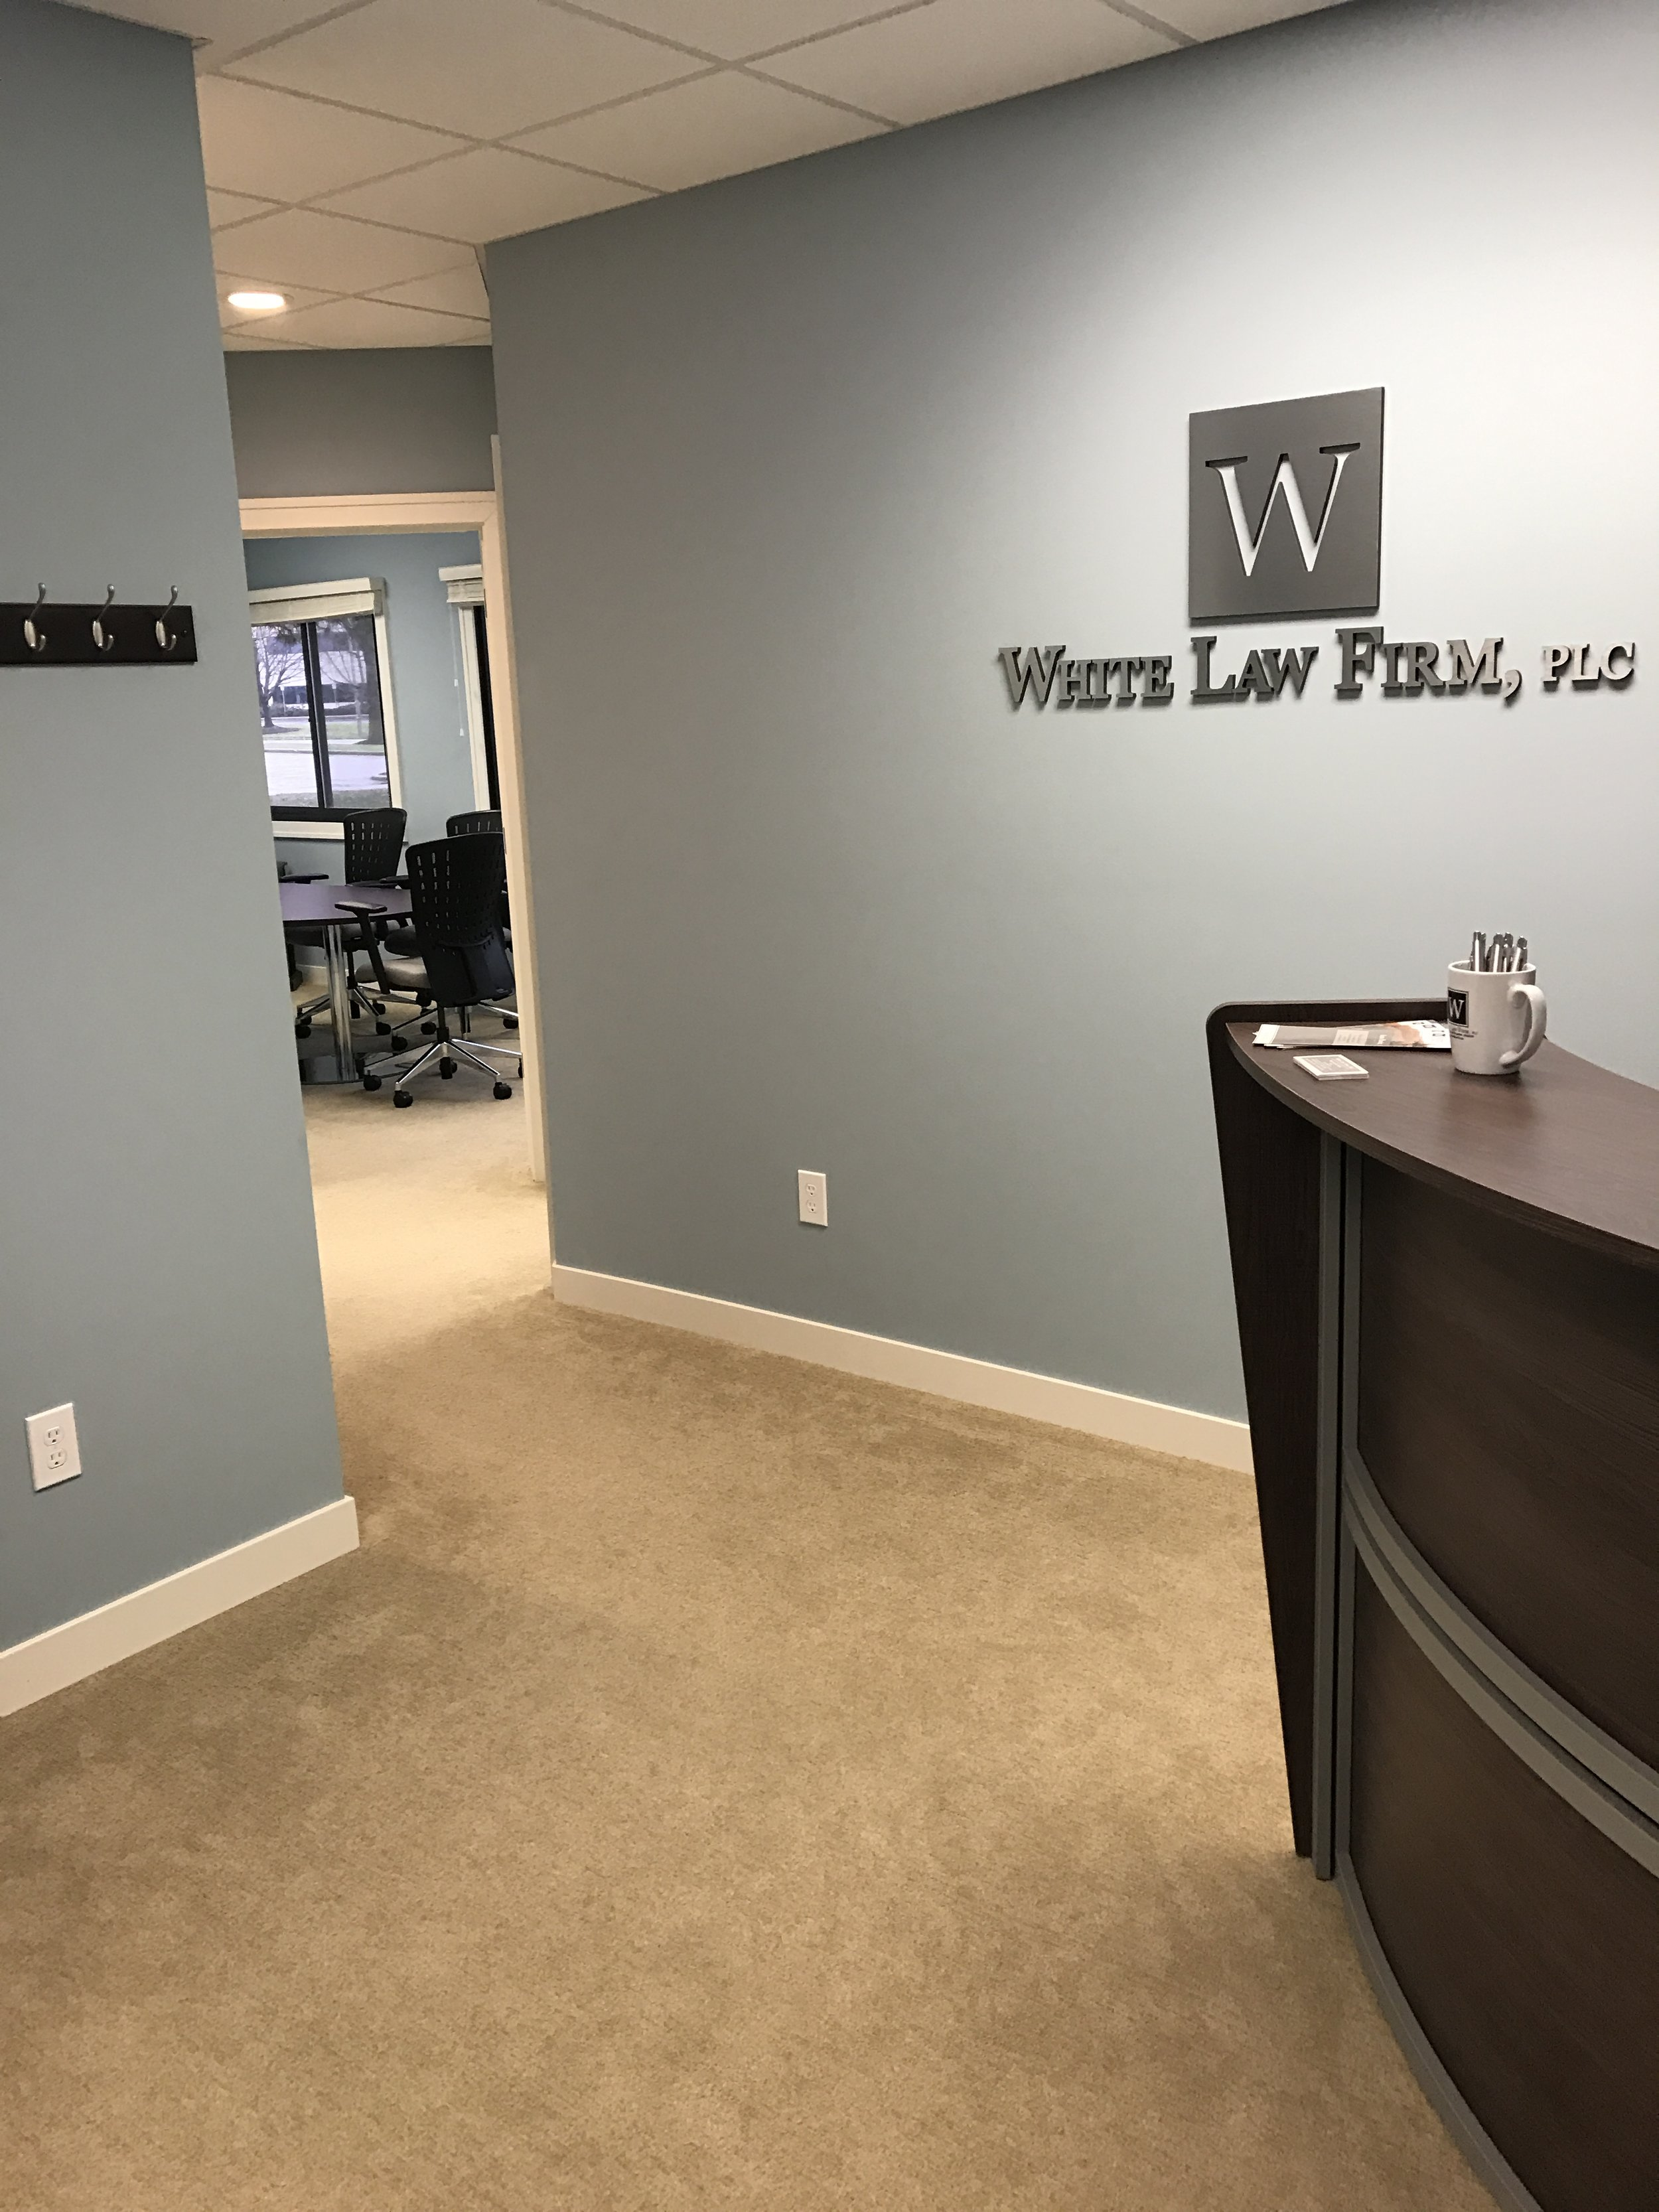 White Law Firm, PLC